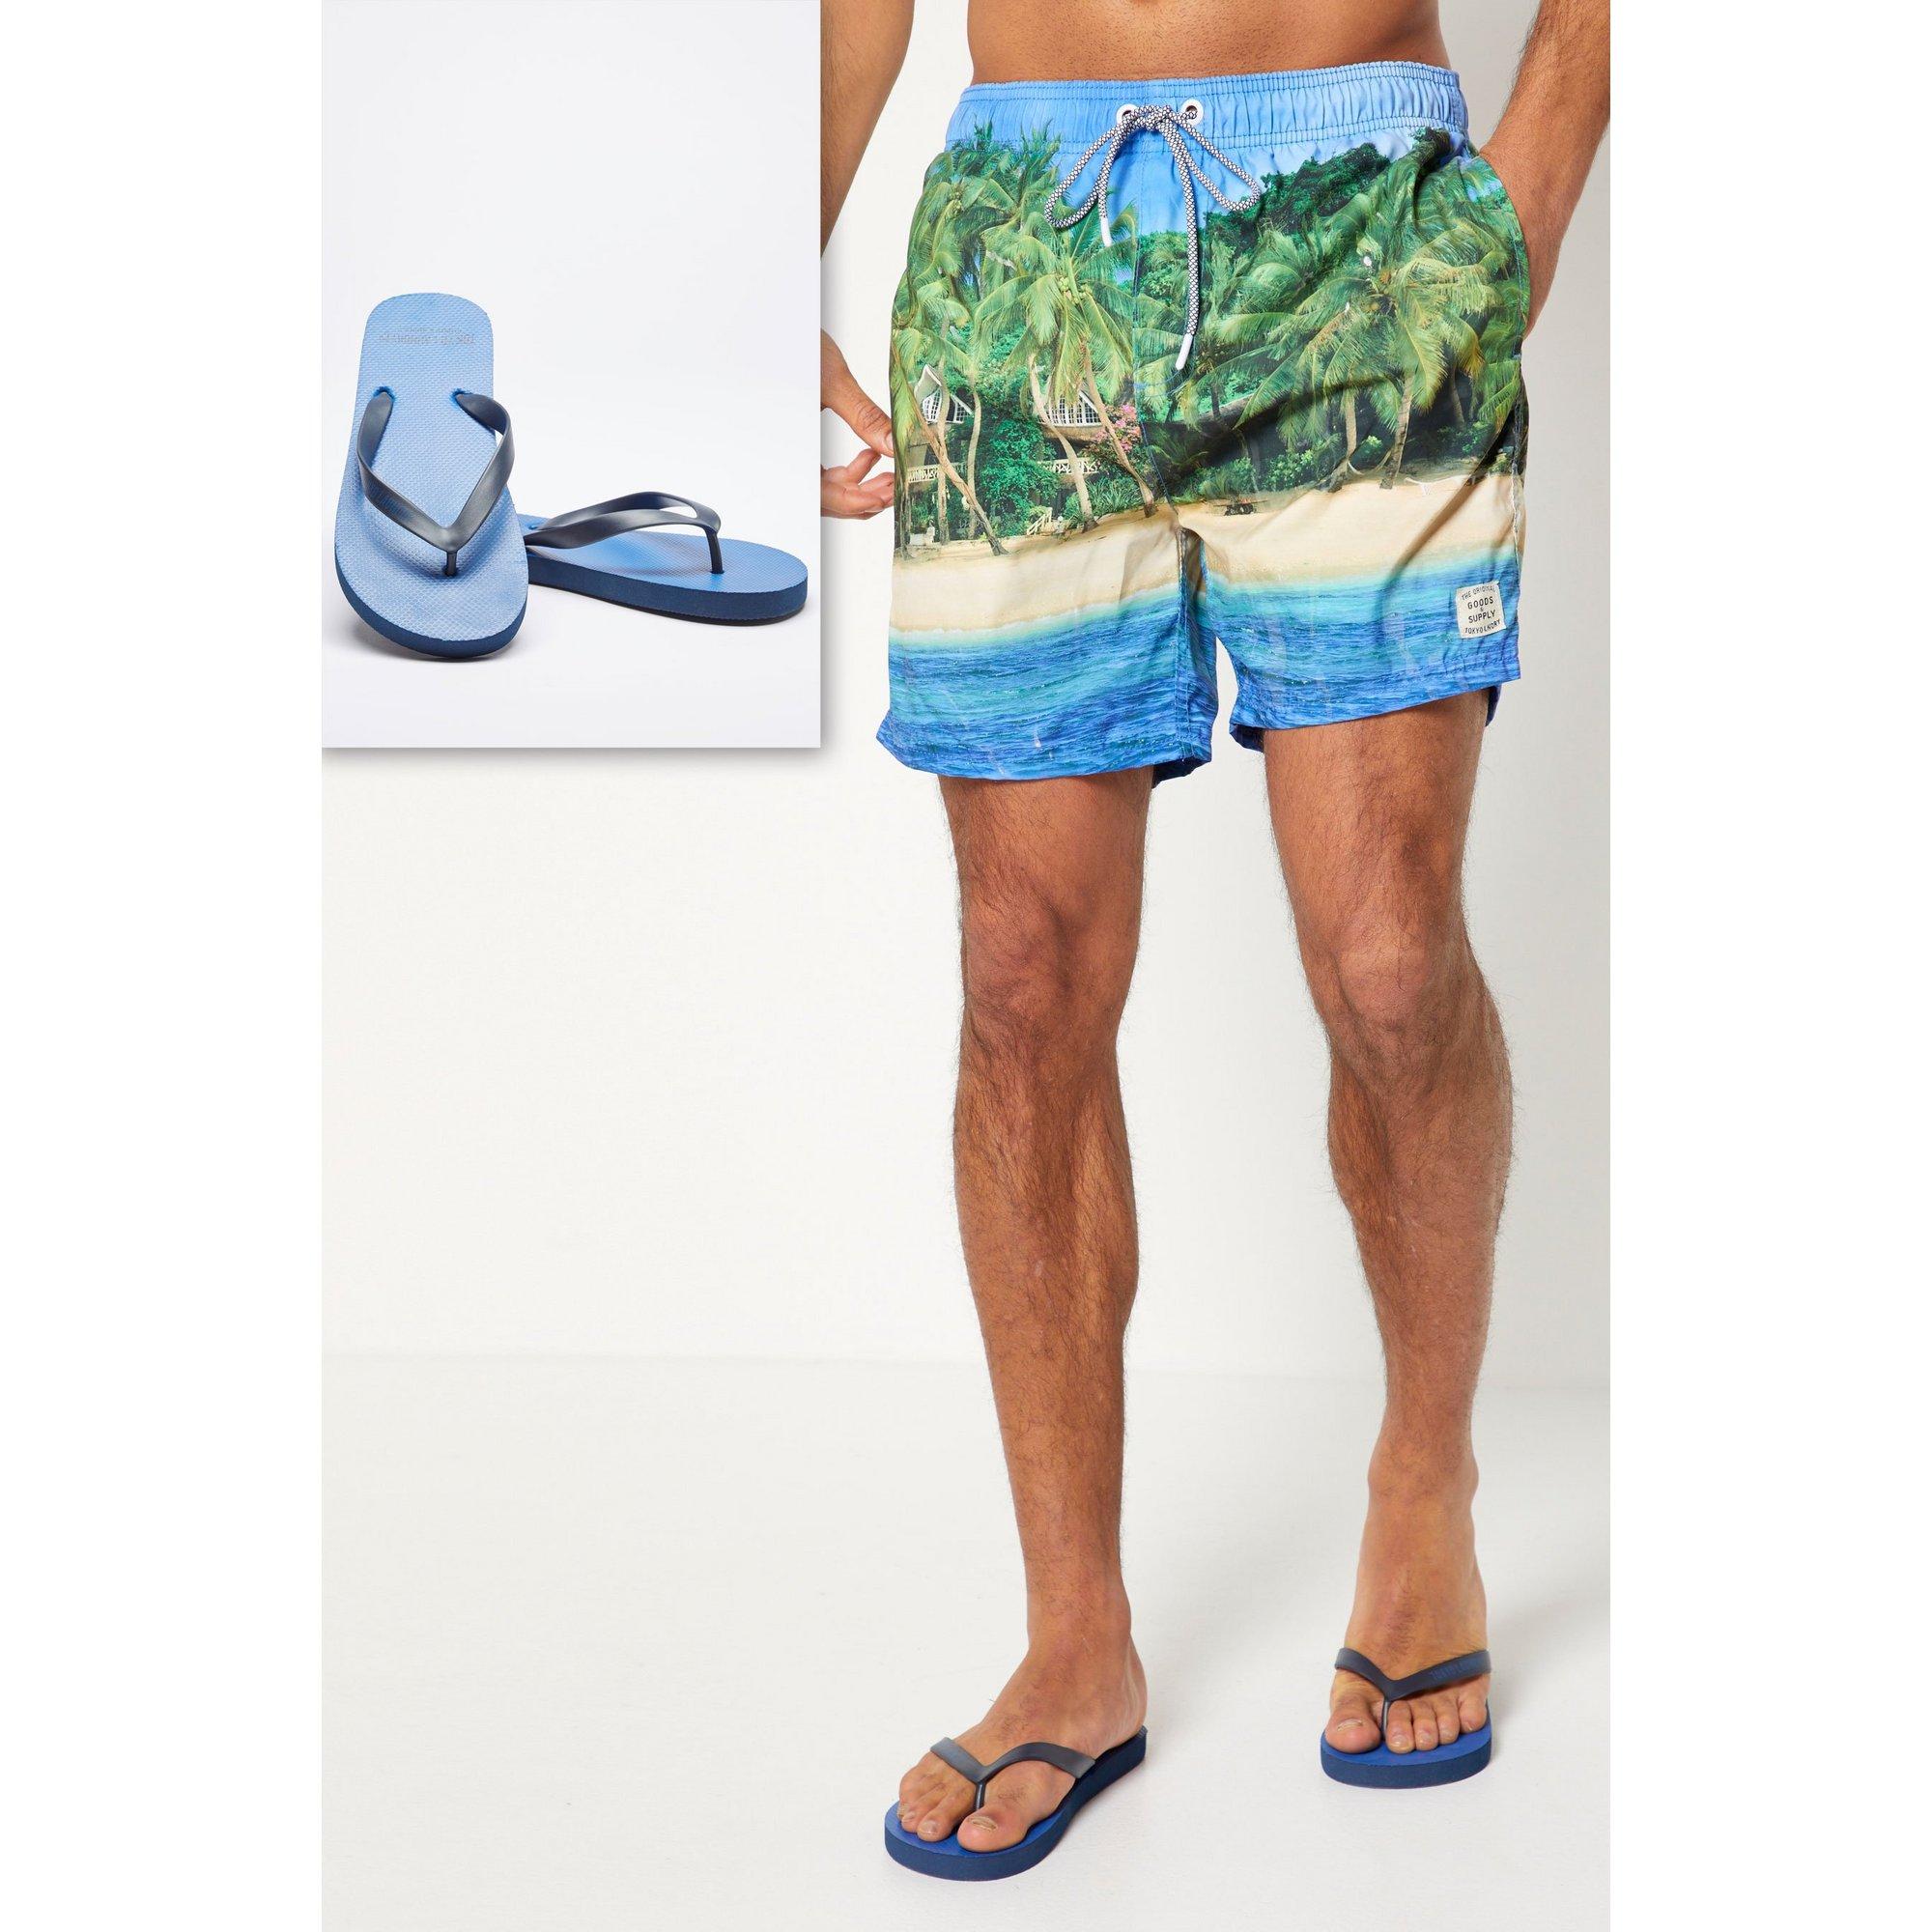 Image of Beach Printed Swim Shorts and Flip Flops